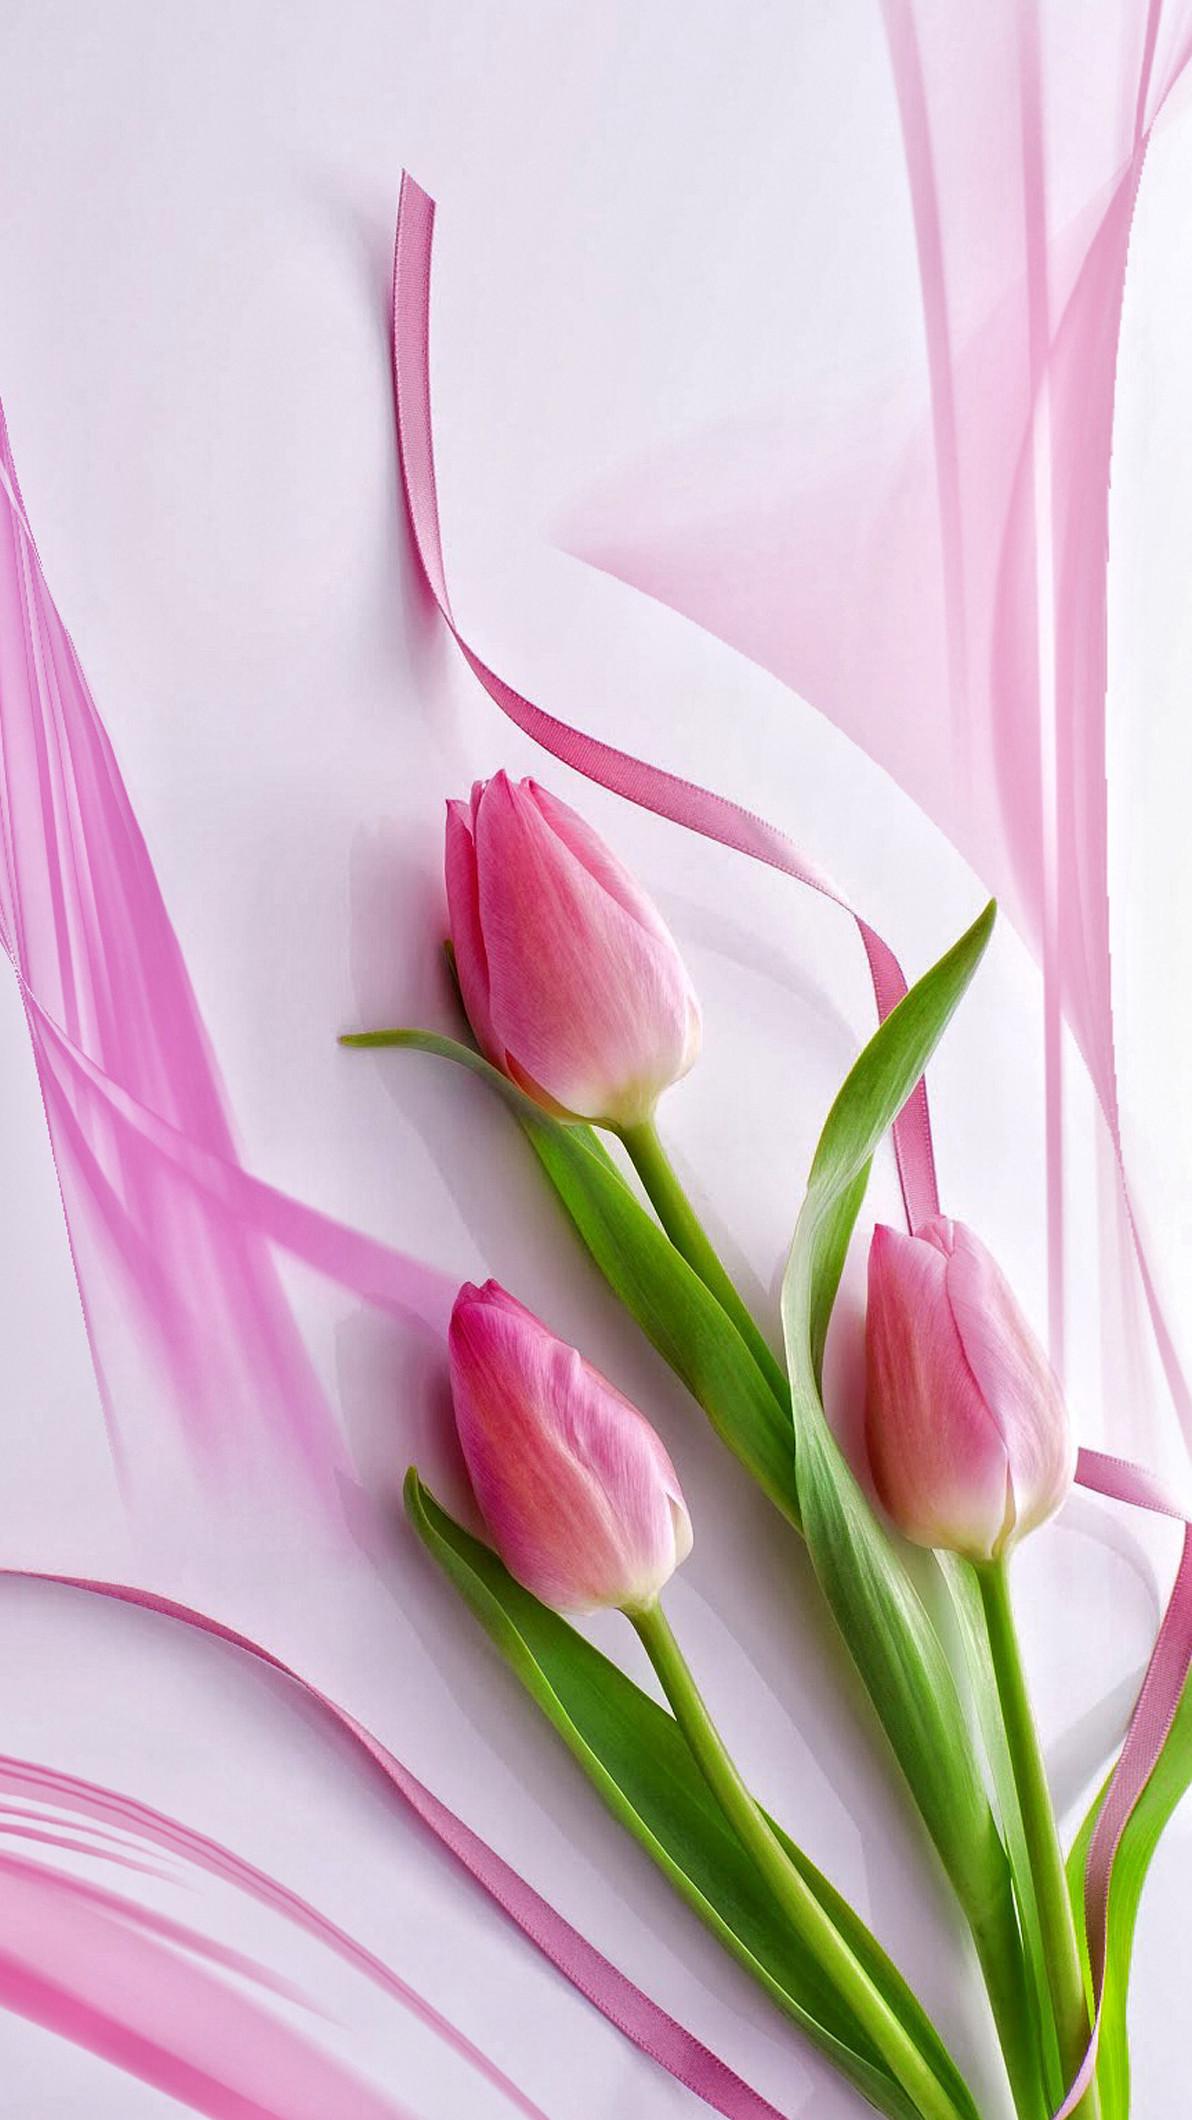 Pink Tulips Wallpaper ·① WallpaperTag